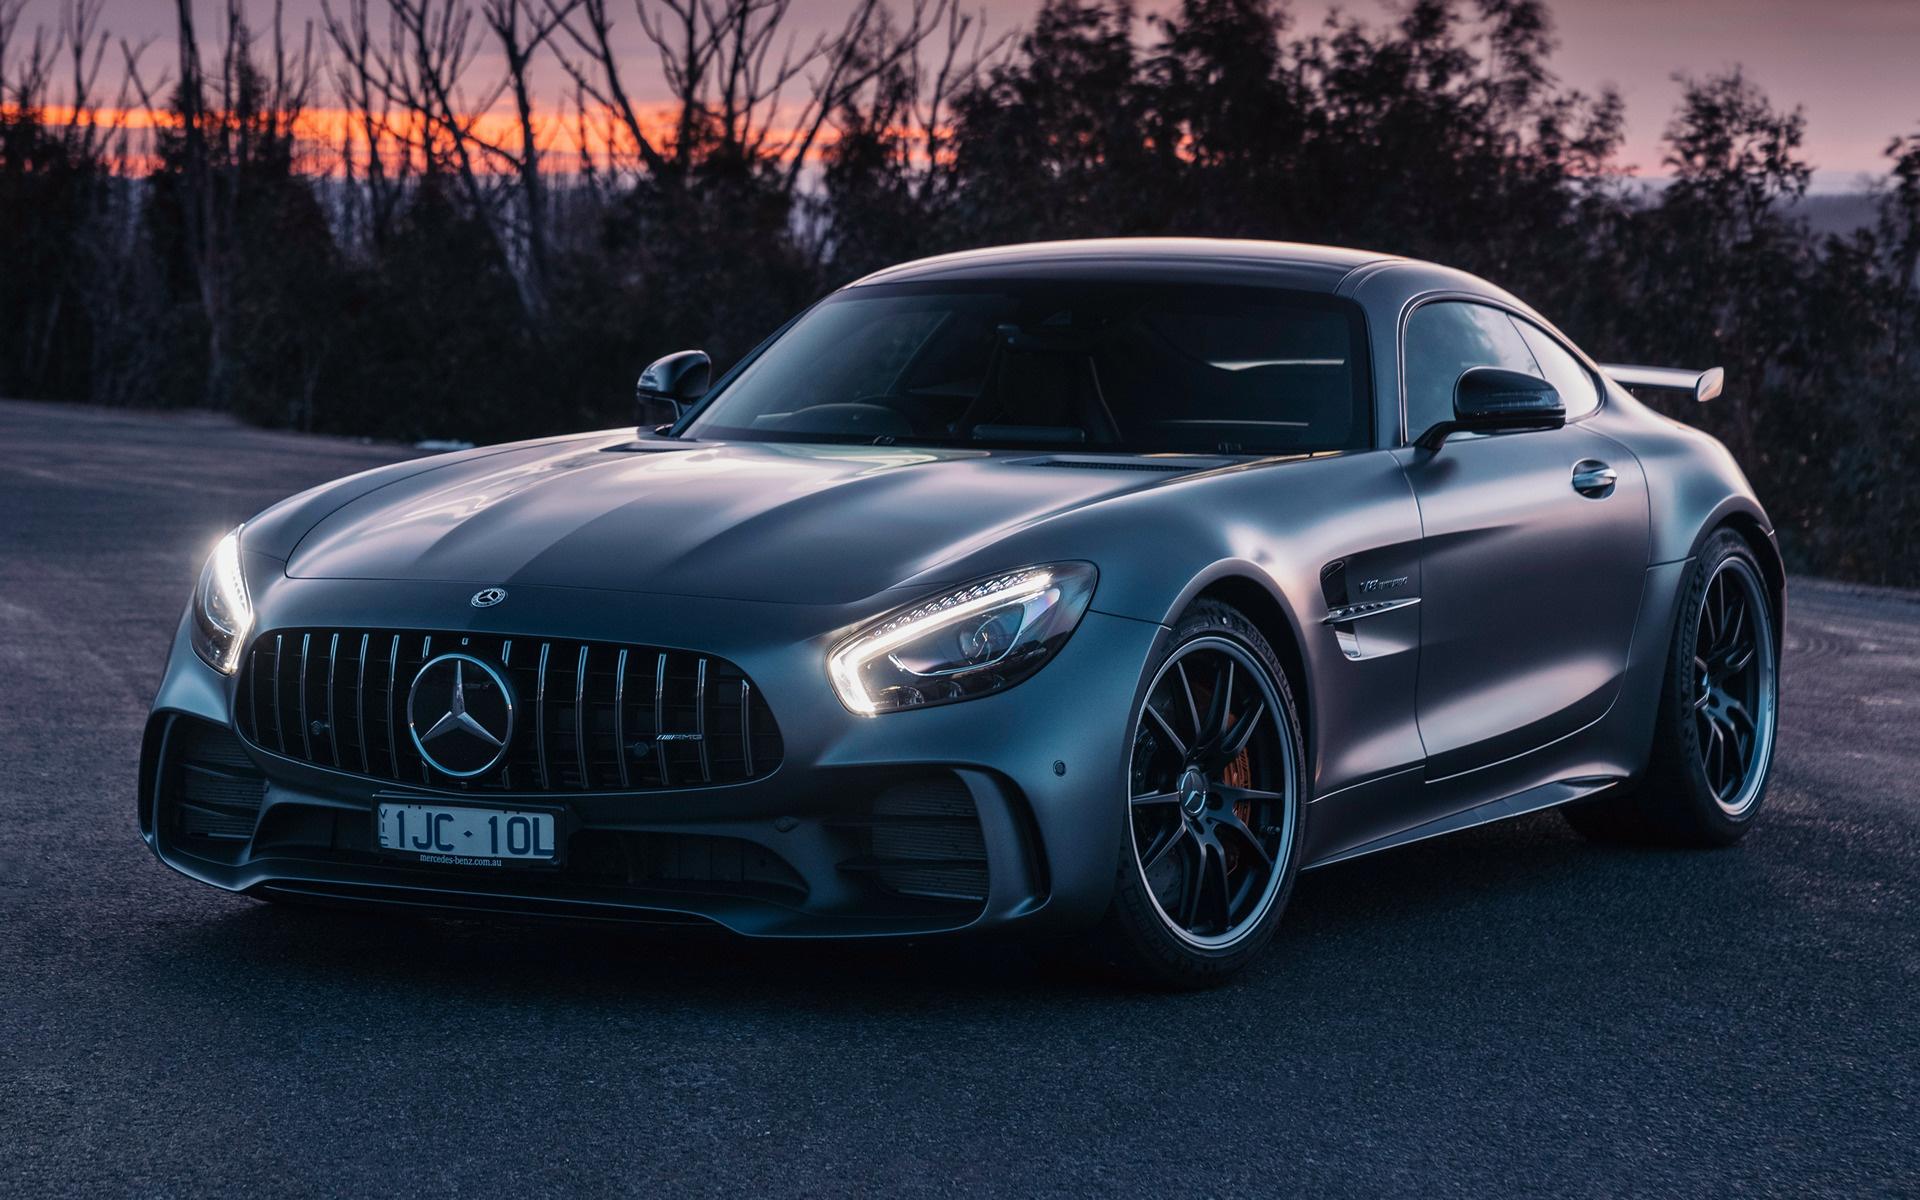 Mercedes Benz Amg Gt >> 2017 Mercedes-AMG GT R (AU) - Fonds d'écran et images HD | Car Pixel